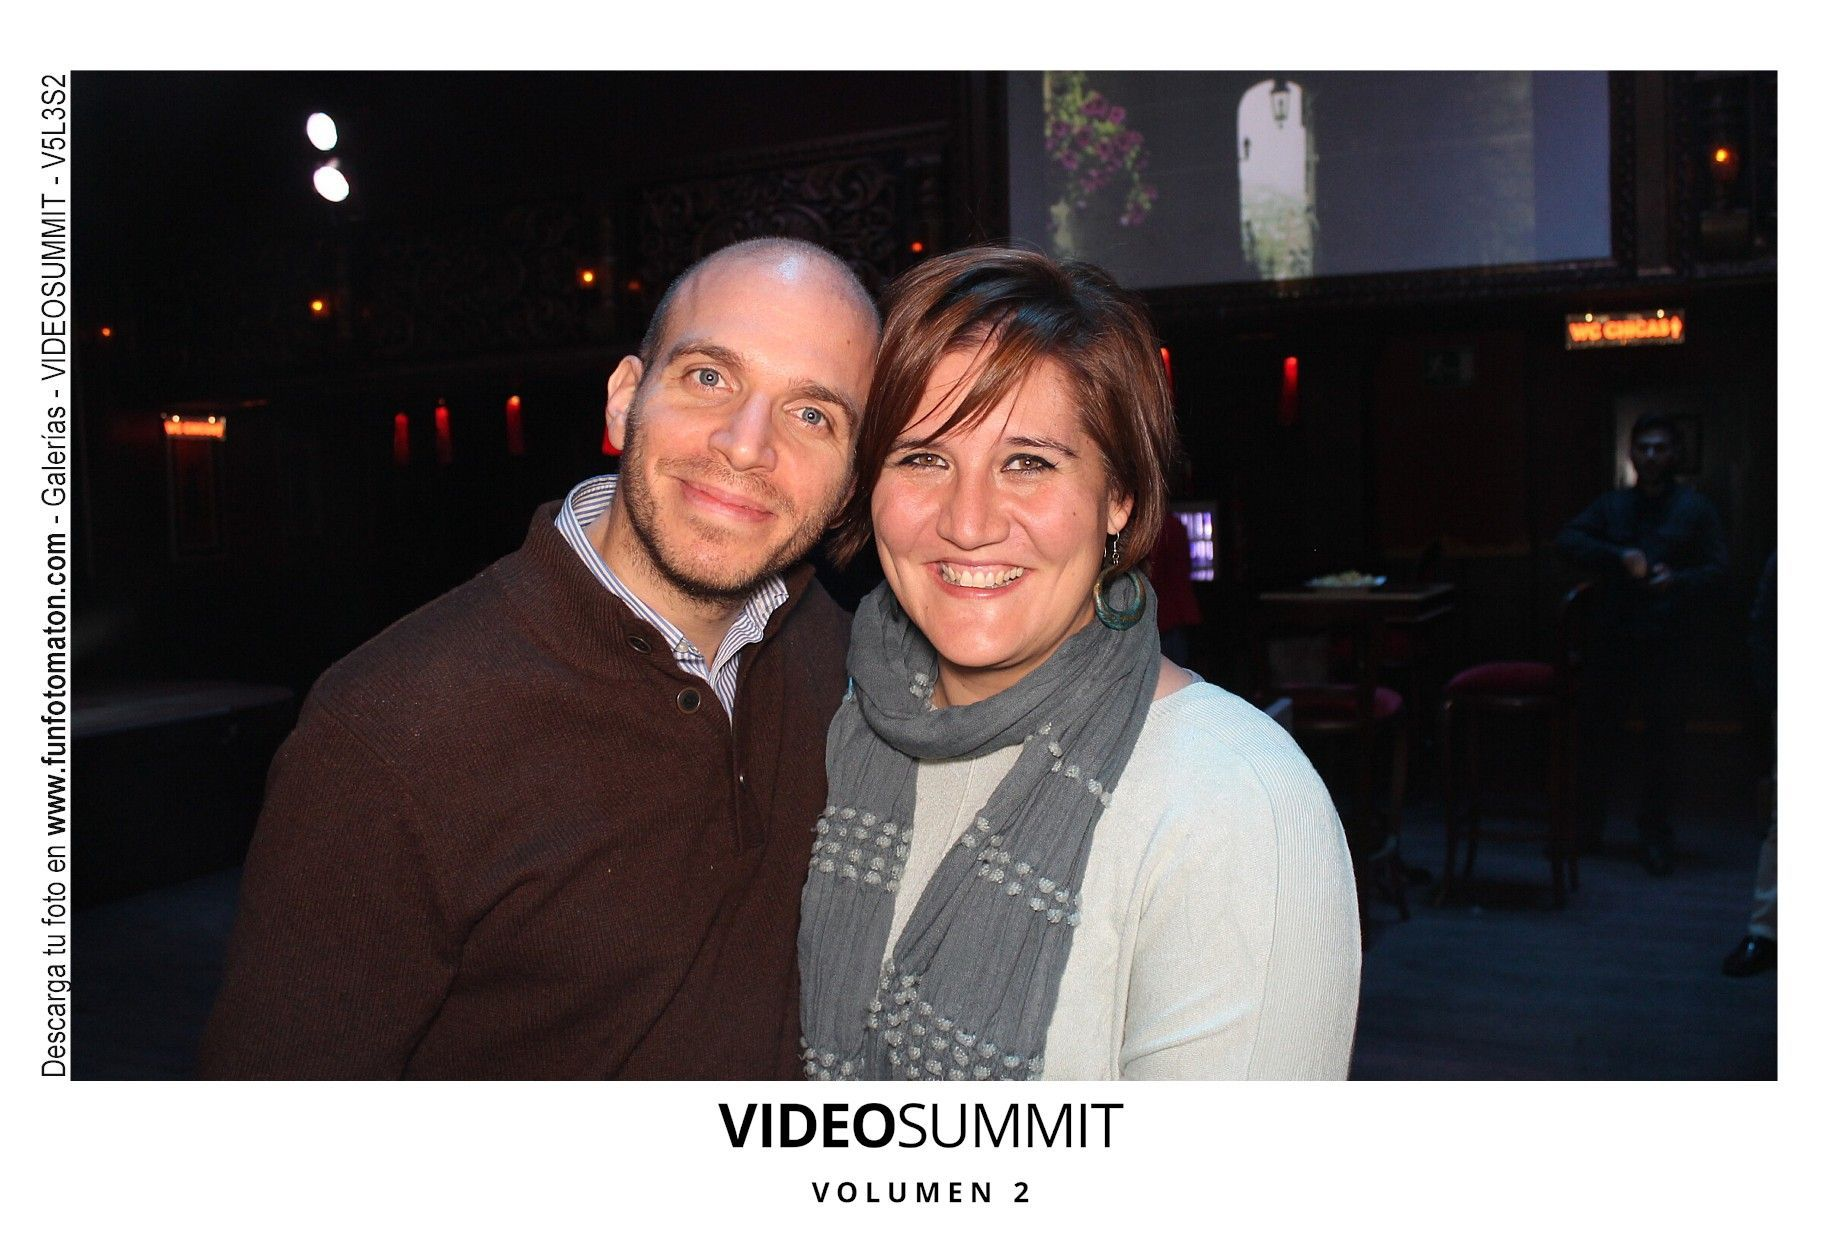 videosummit-vol2-club-party-076